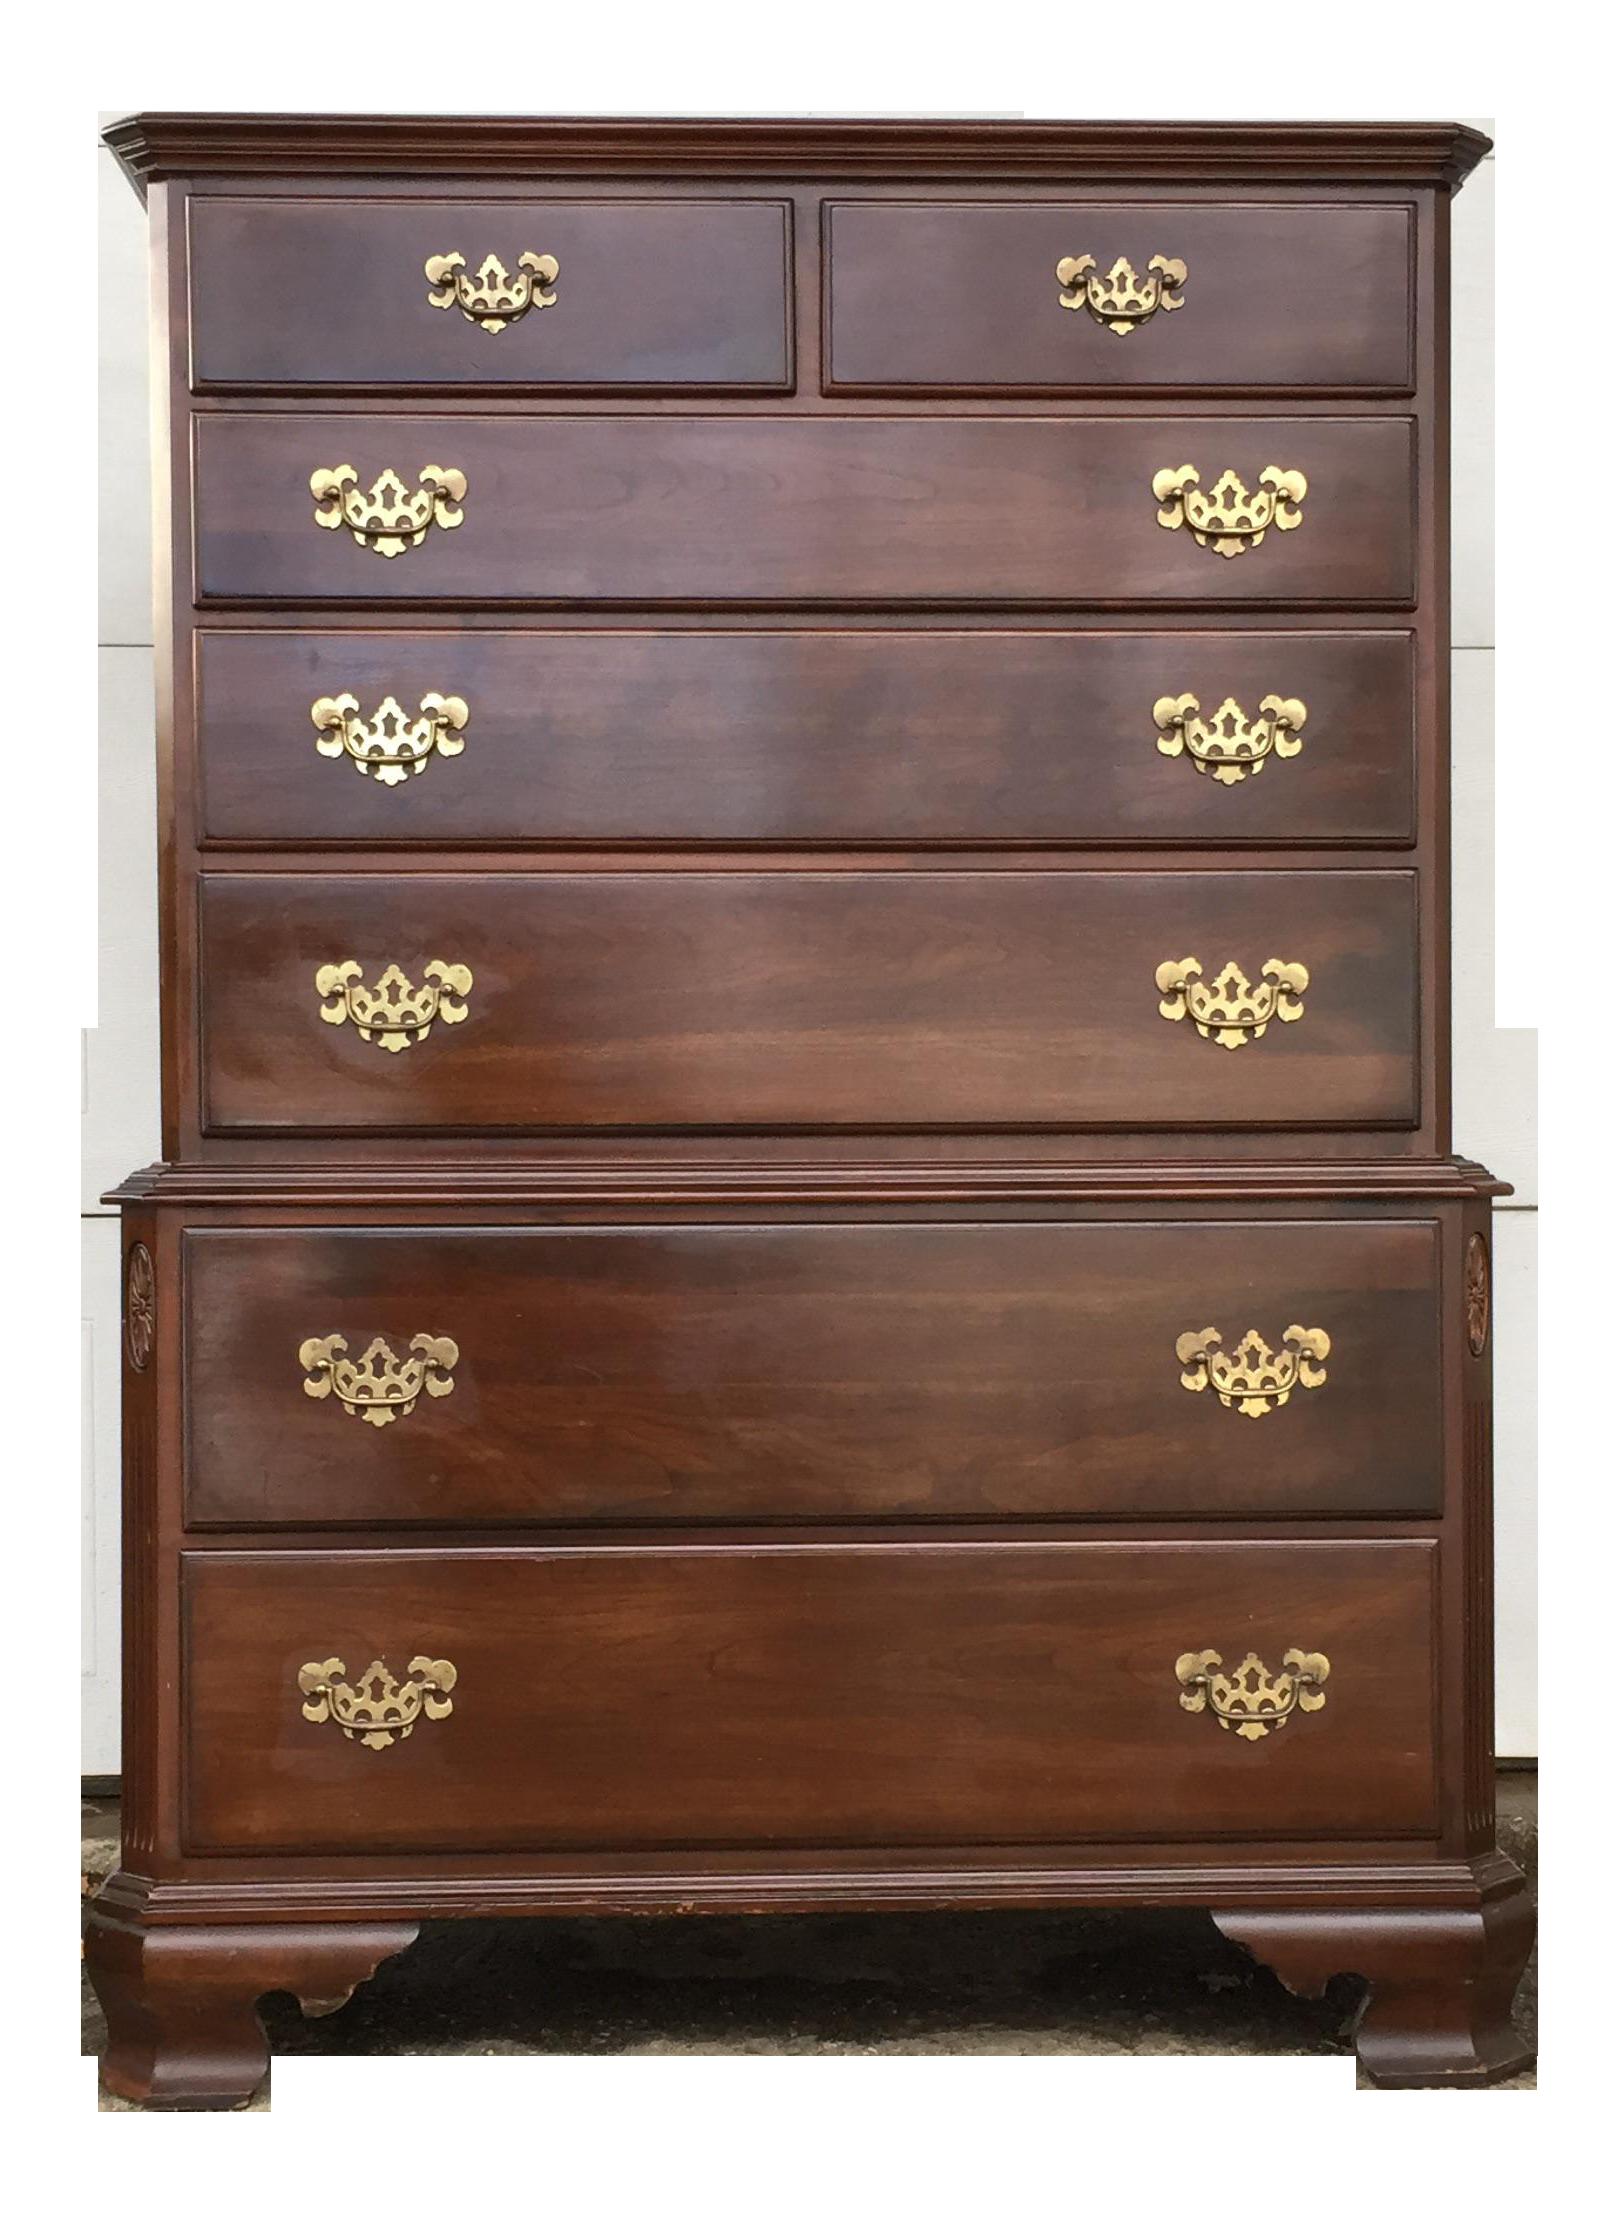 Second Hand Oak Bedroom Furniture Gently Used Ethan Allen Furniture Chairish